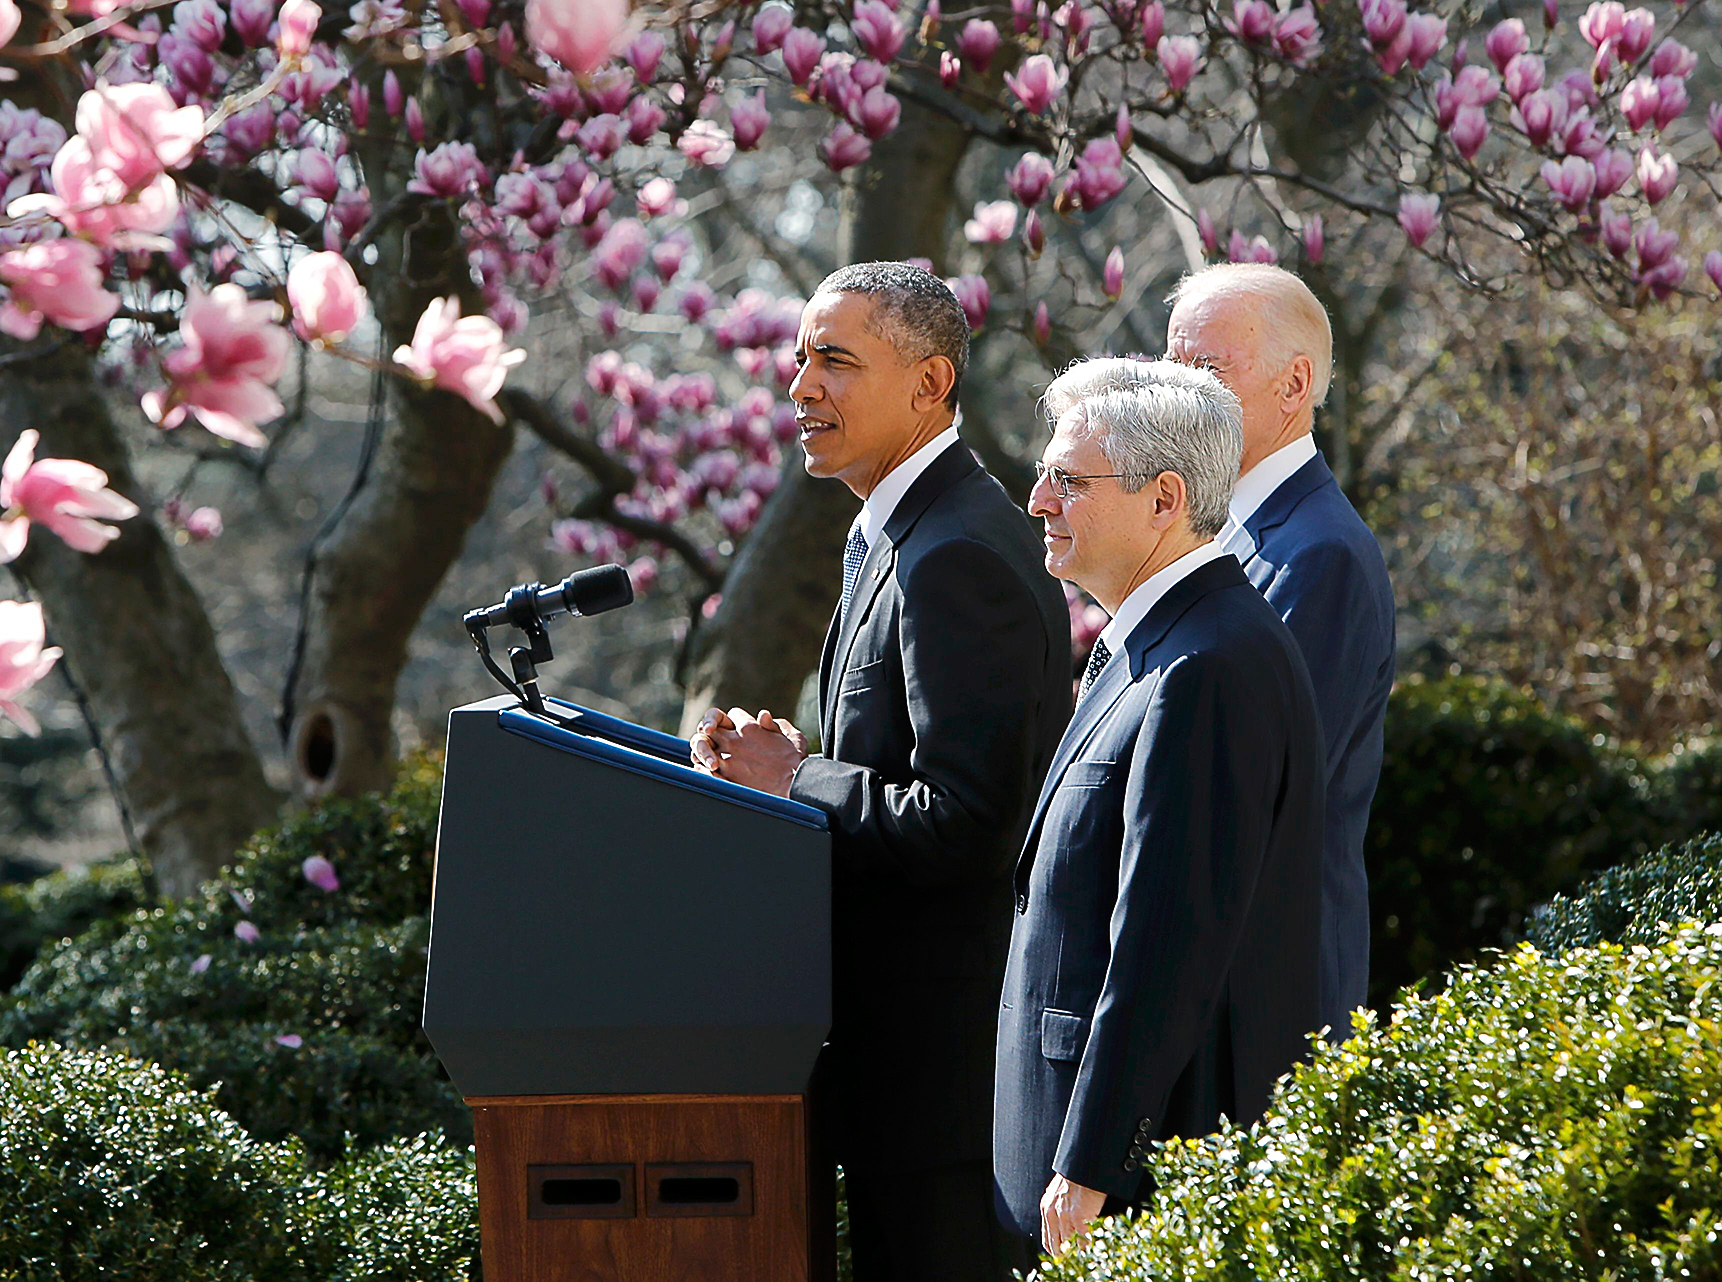 Chief DC Circuit Judge Merrick Garland (center) is Obama's third nominee to the Supreme Court